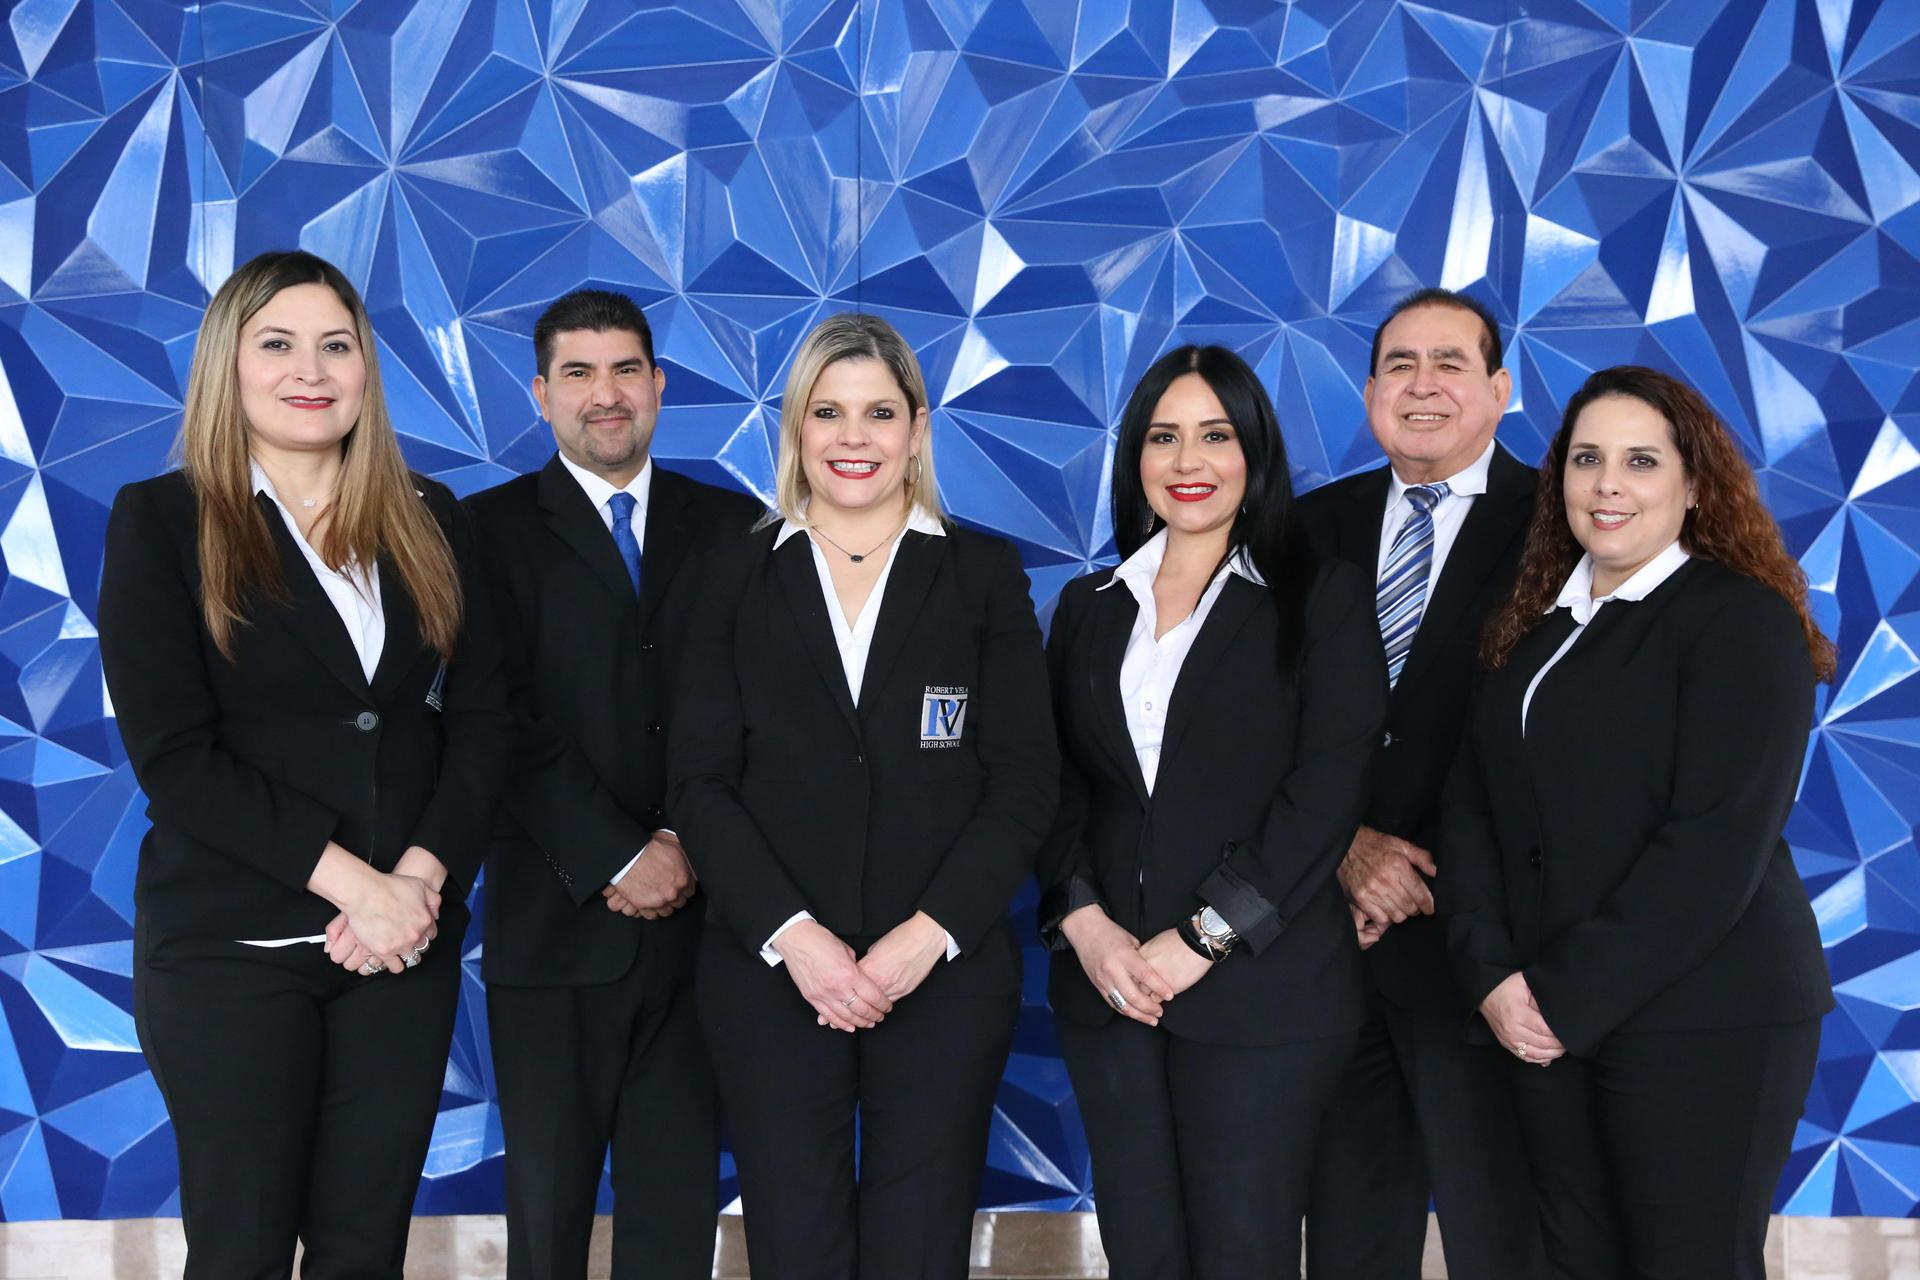 RVHS, Administration, Staff